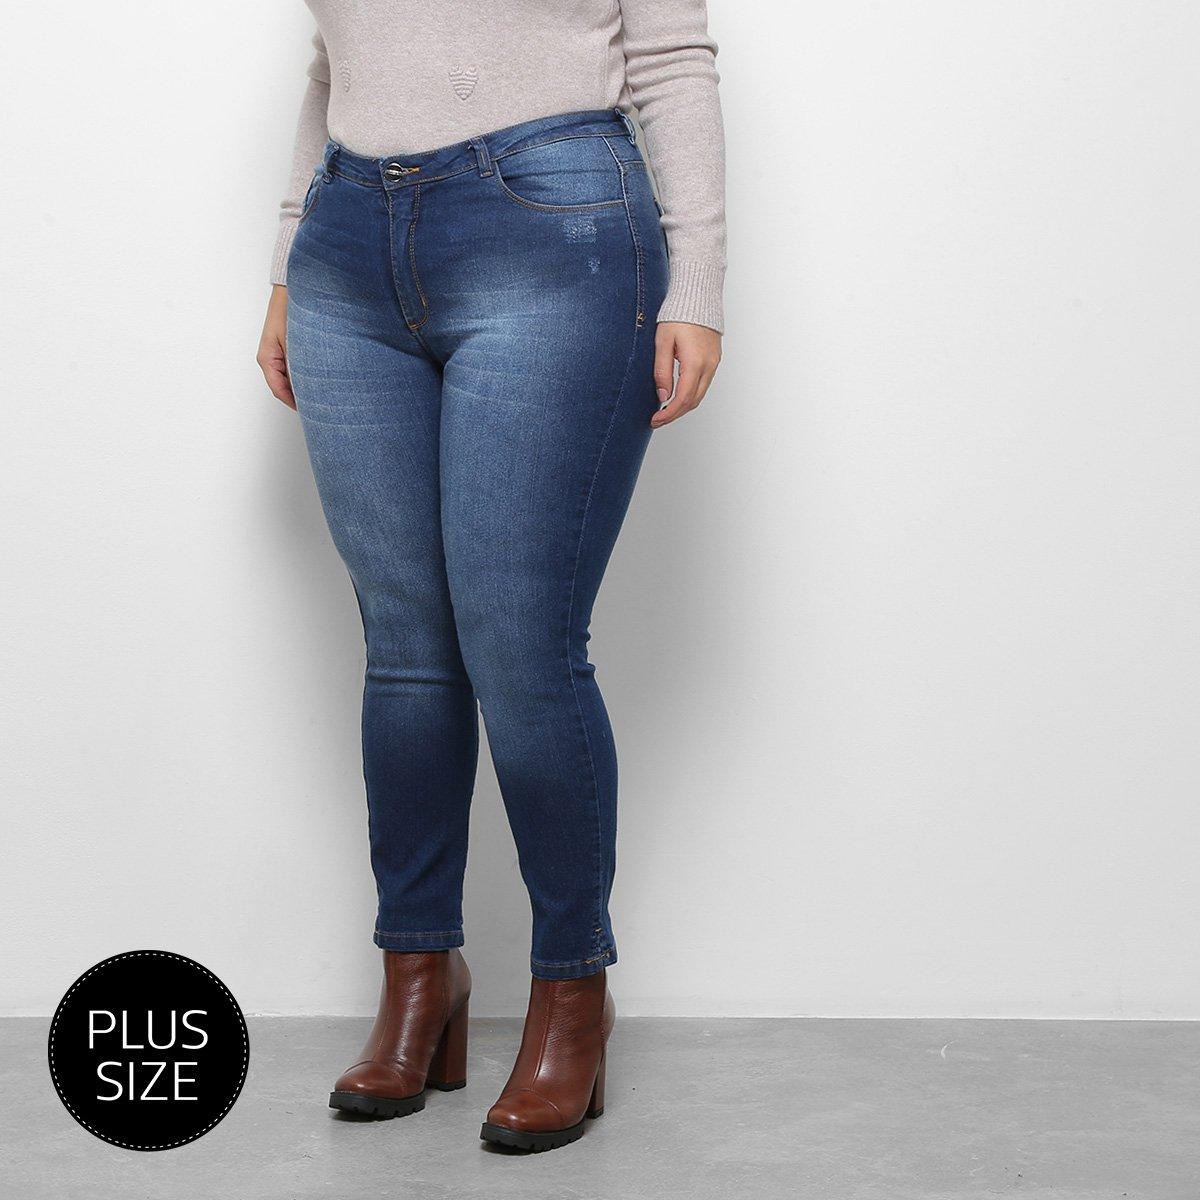 f35954373 Calça Jeans Razon Cigarrete Plus Size Feminina